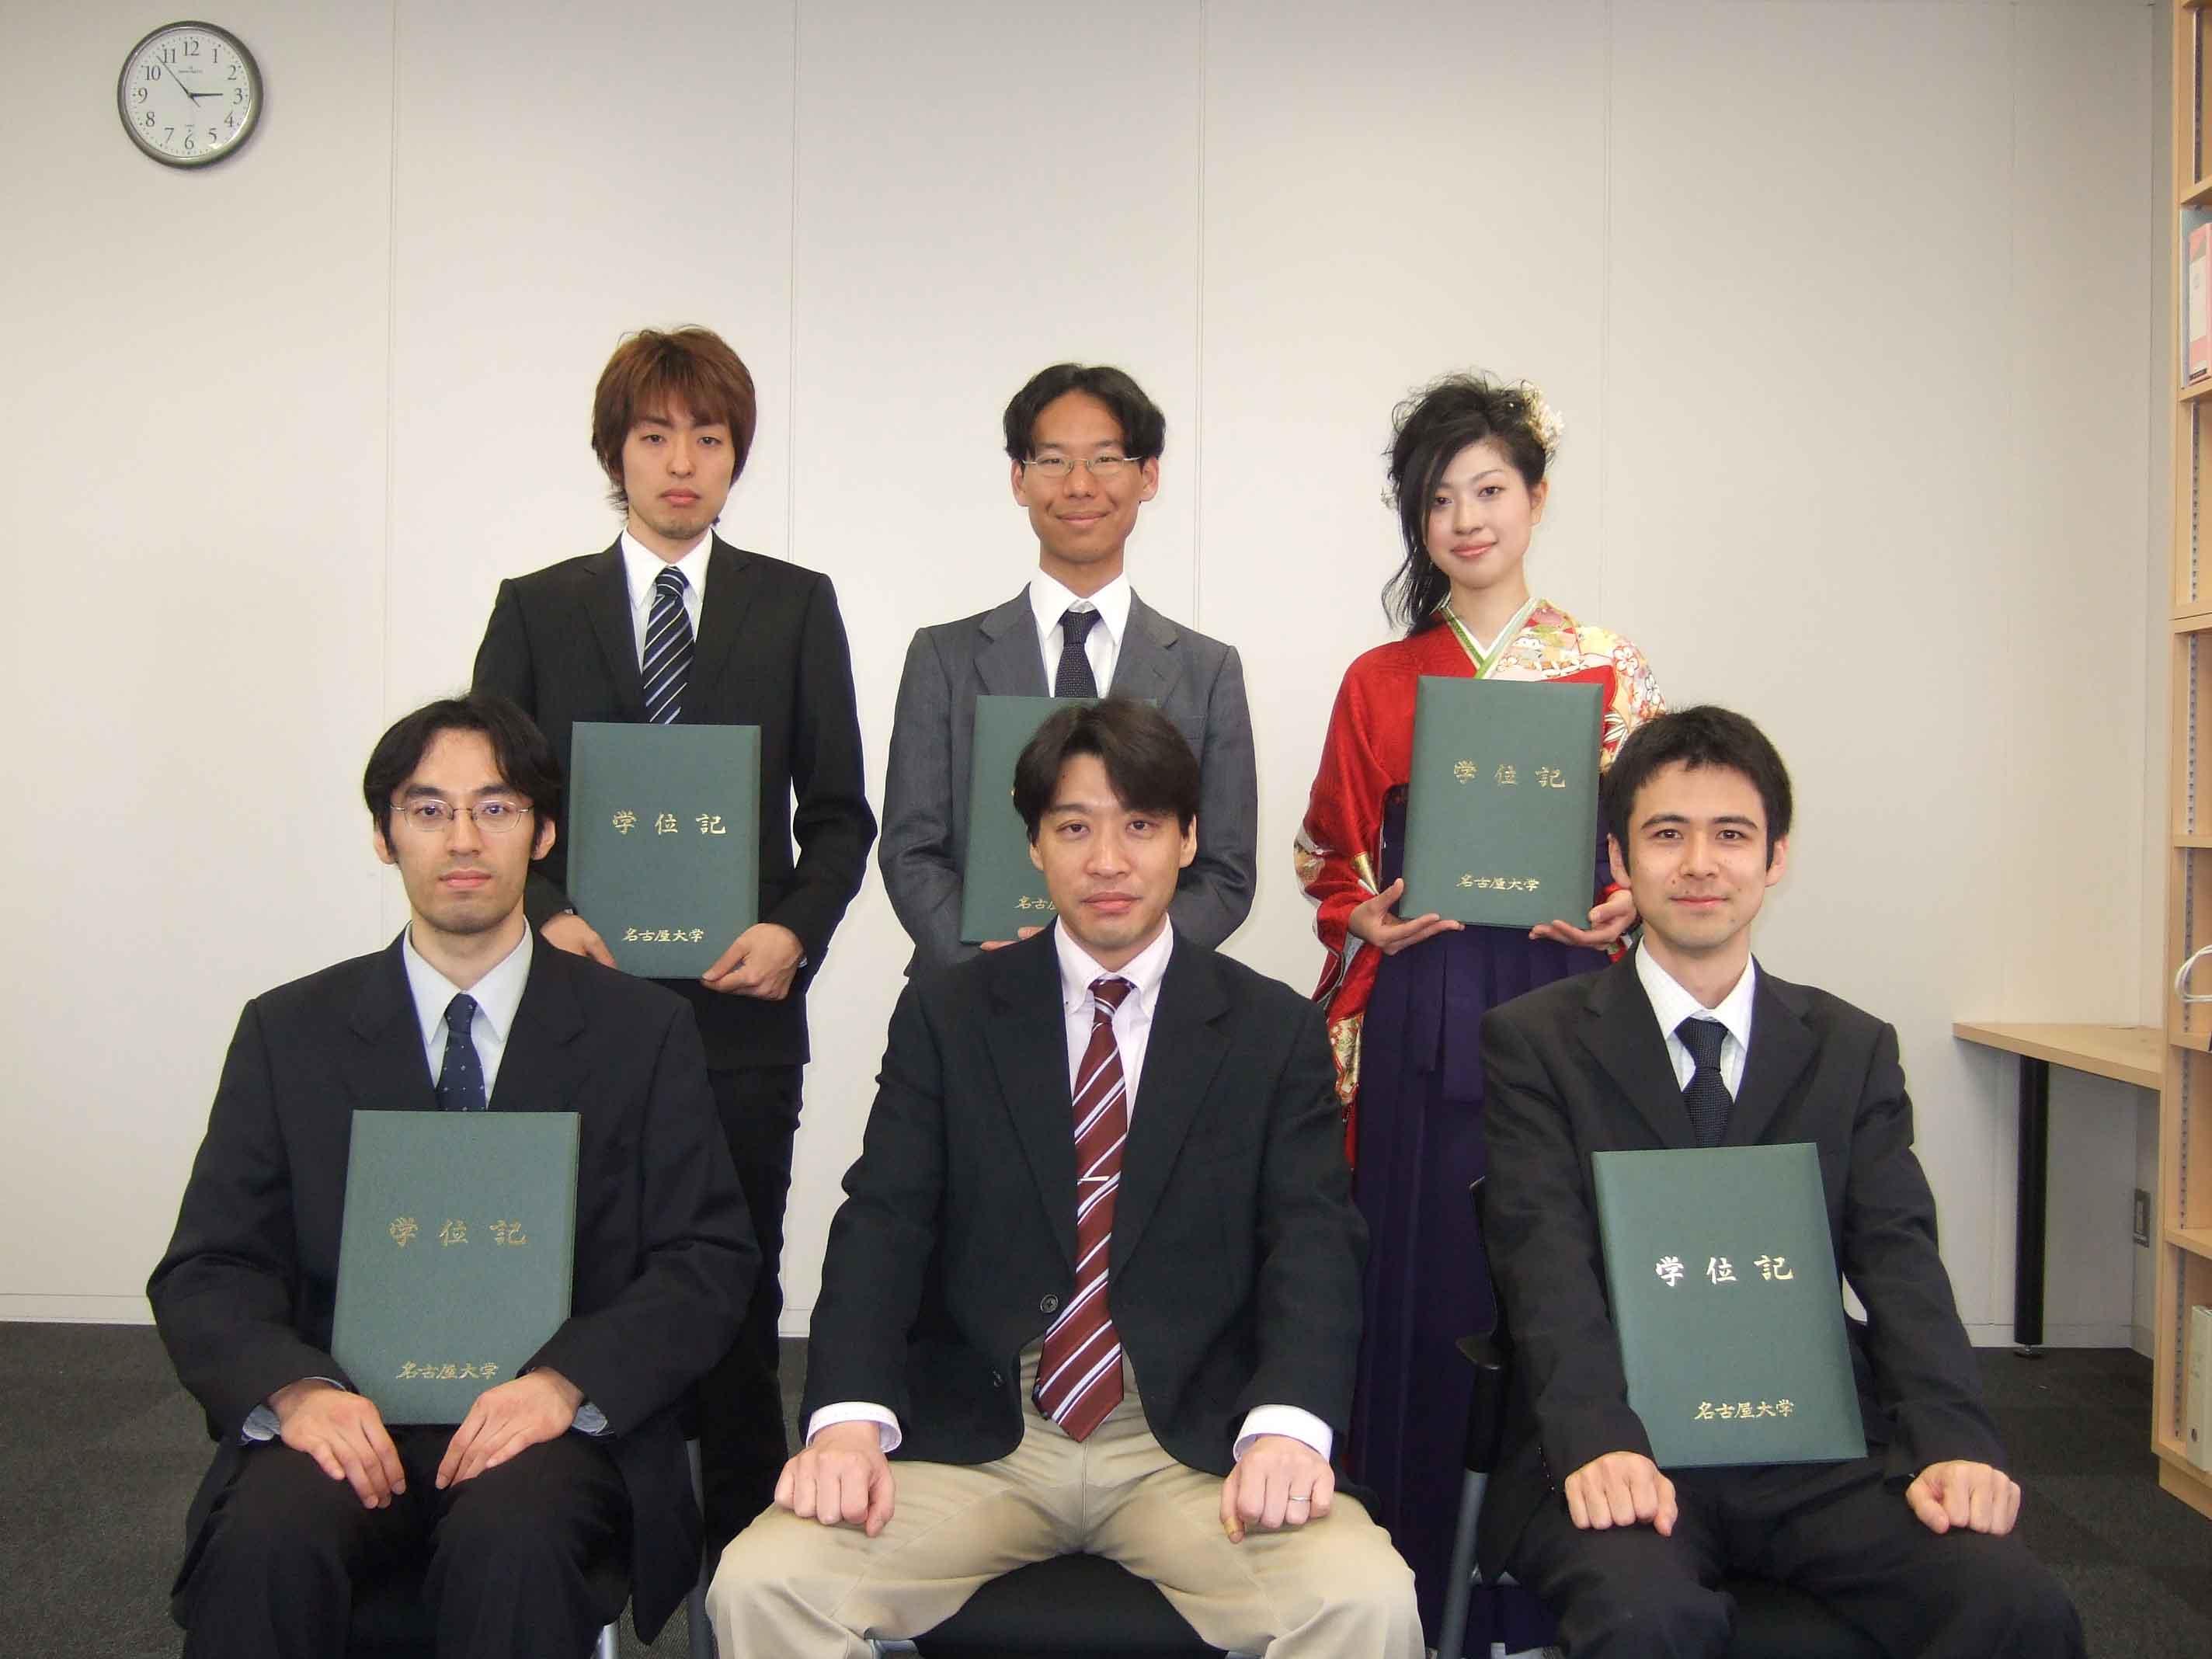 http://synth.chem.nagoya-u.ac.jp/wordpress/wp-content/uploads/2008/03/20080325_01.jpg